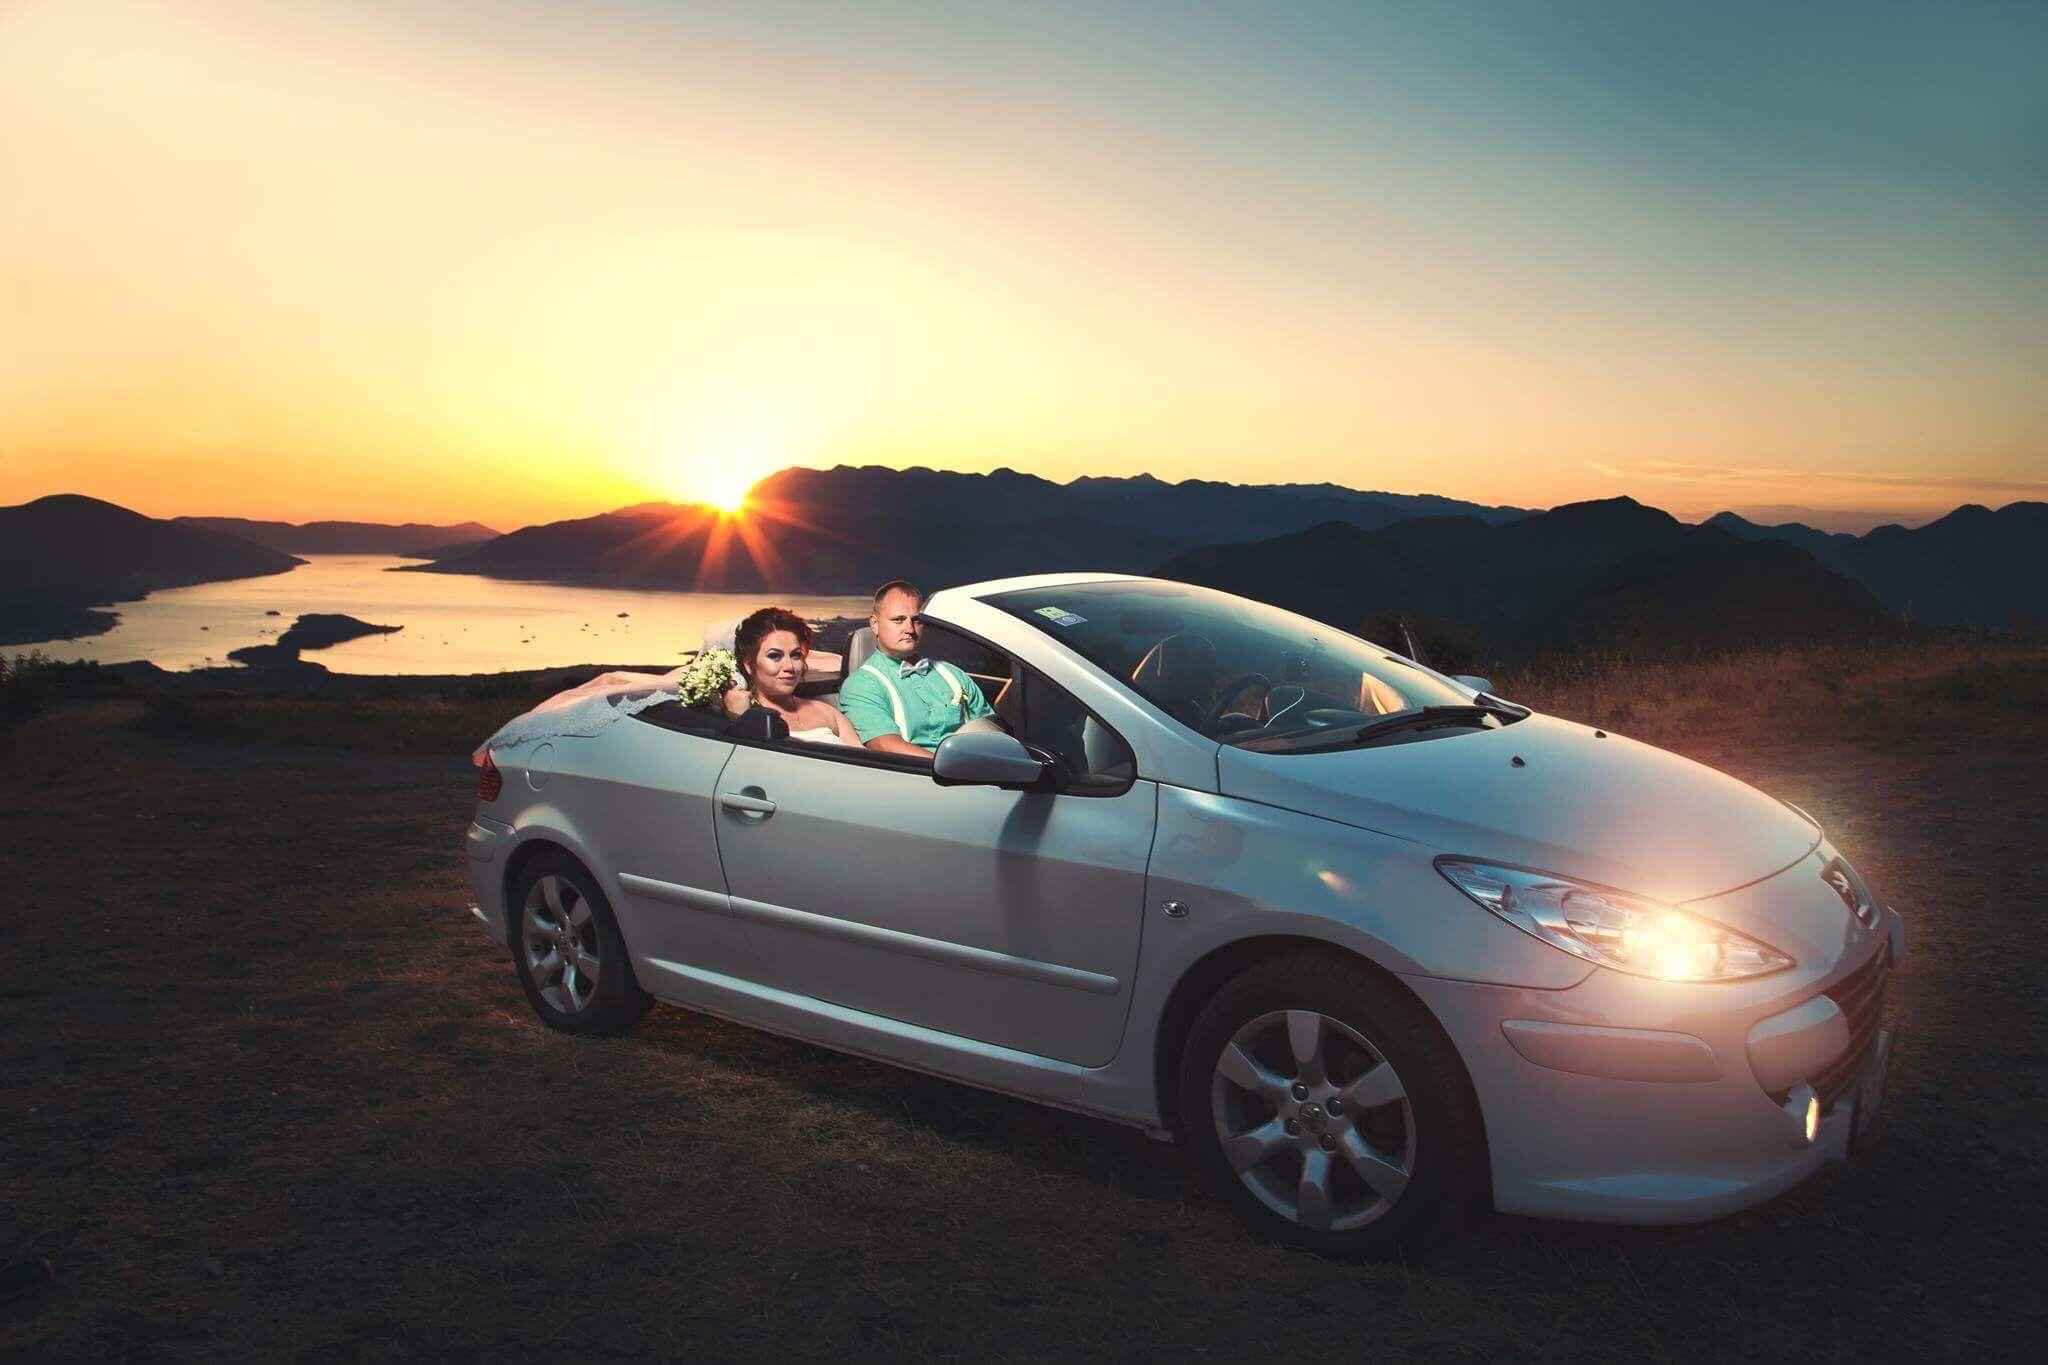 Peugeot 307 Cc Cabrio For Wedding Peugeot Bmw Bmw Car